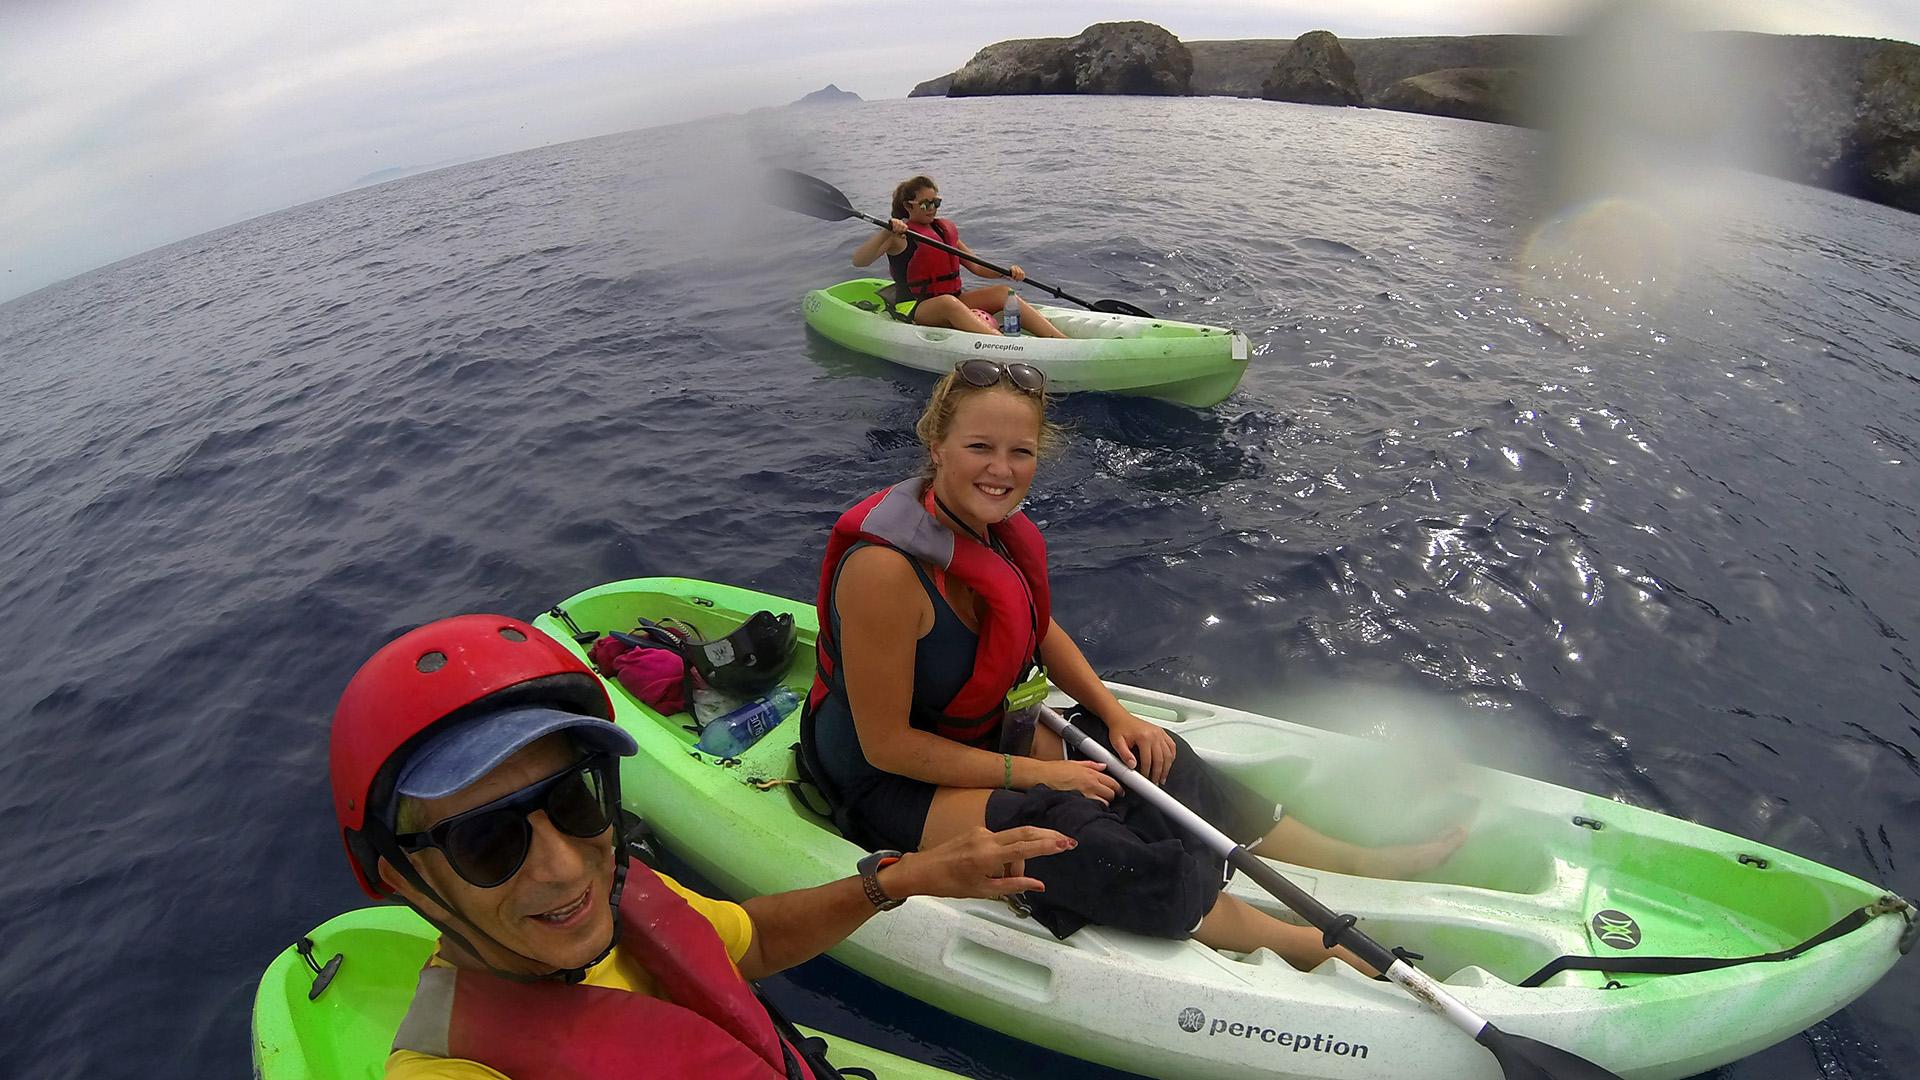 3 kayakers at Scorpion Anchorage, Santa Cruz Island, California Channel Islands